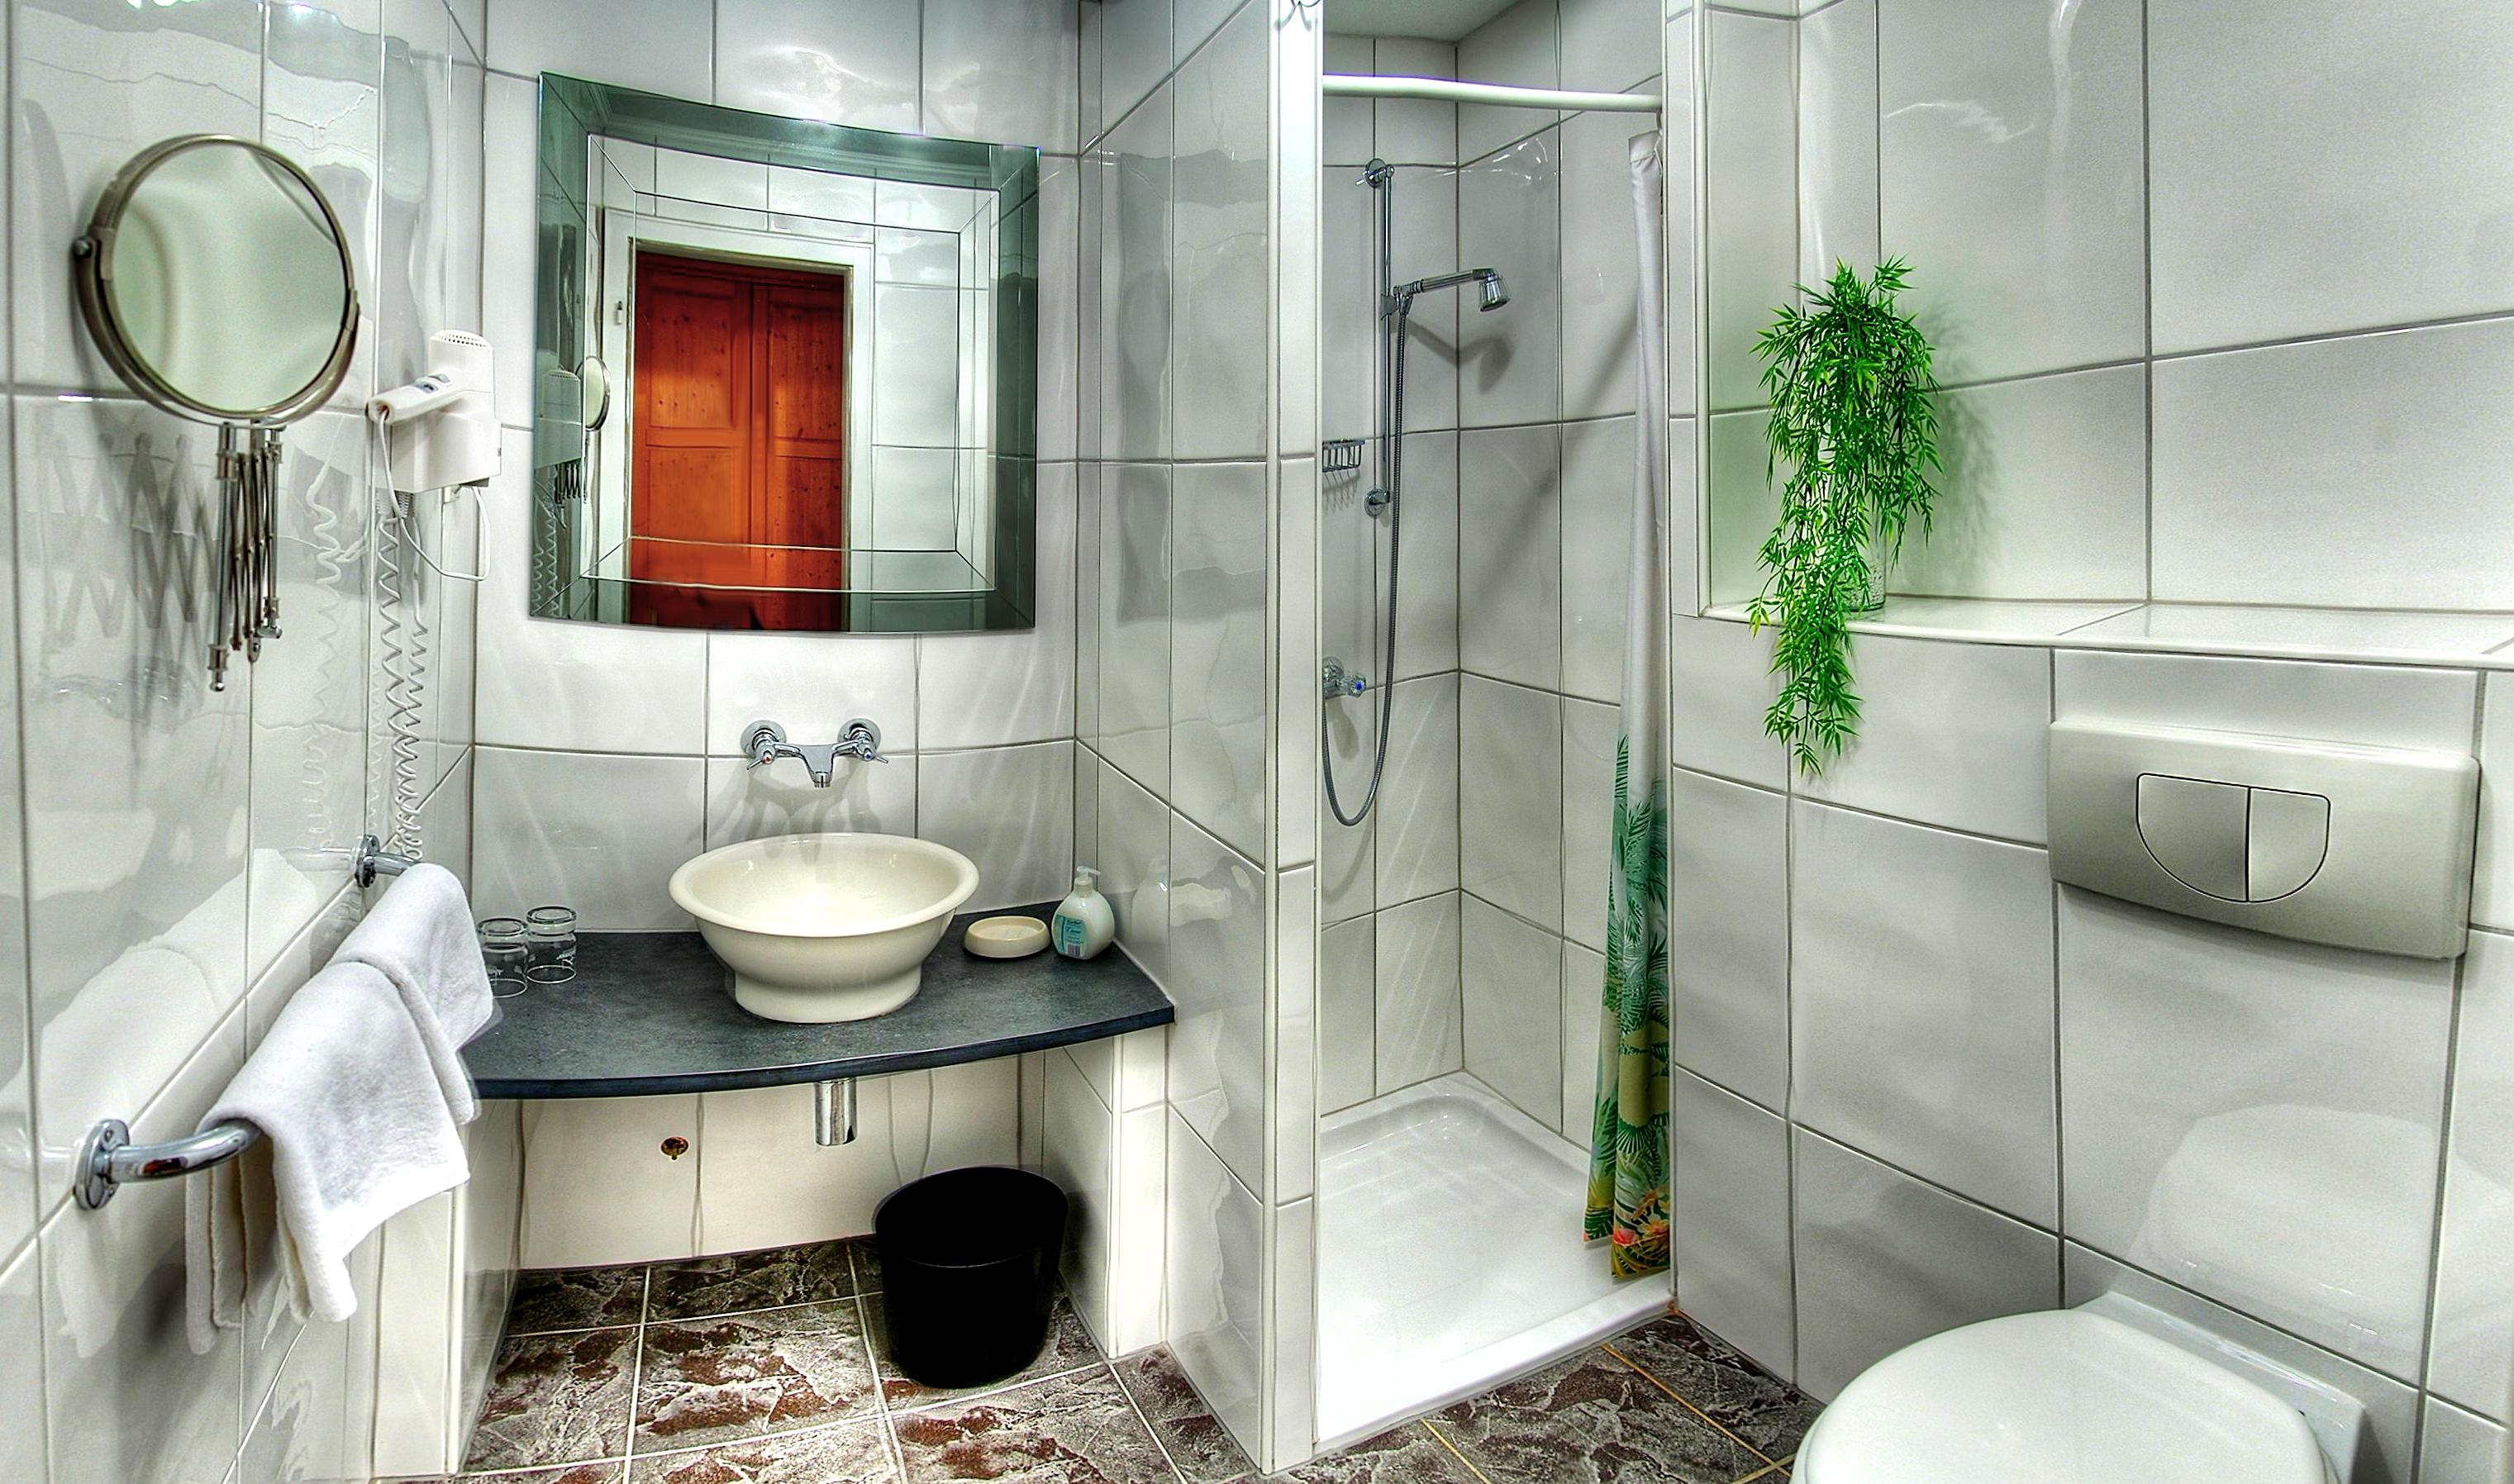 fondos de pantalla 3042x1796 diseño interior cuarto de baño